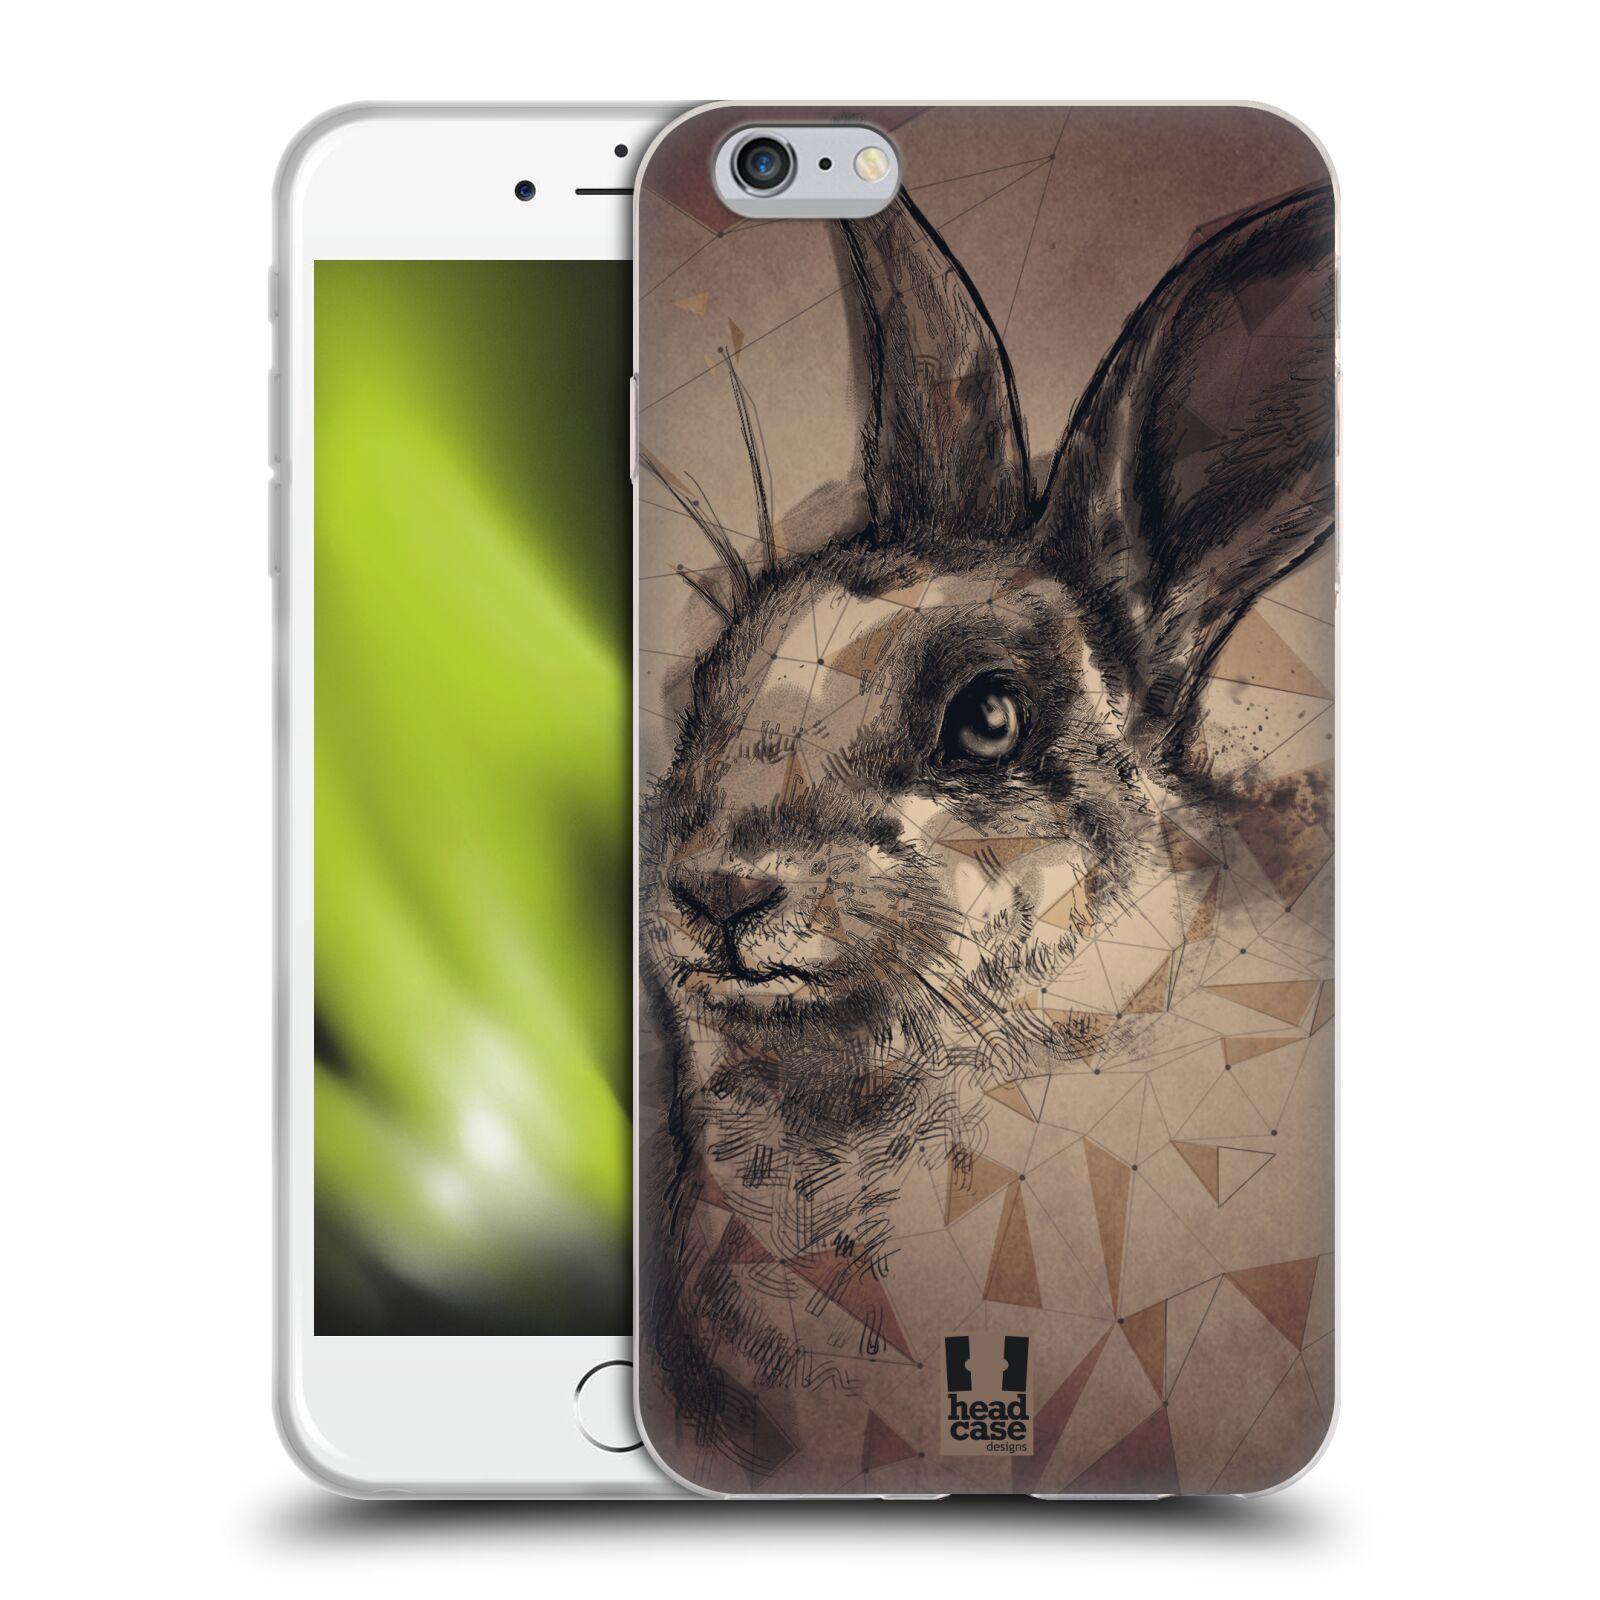 HEAD CASE silikonový obal na mobil Apple Iphone 6 PLUS/ 6S PLUS vzor Skica zvíře kreslené zajíc